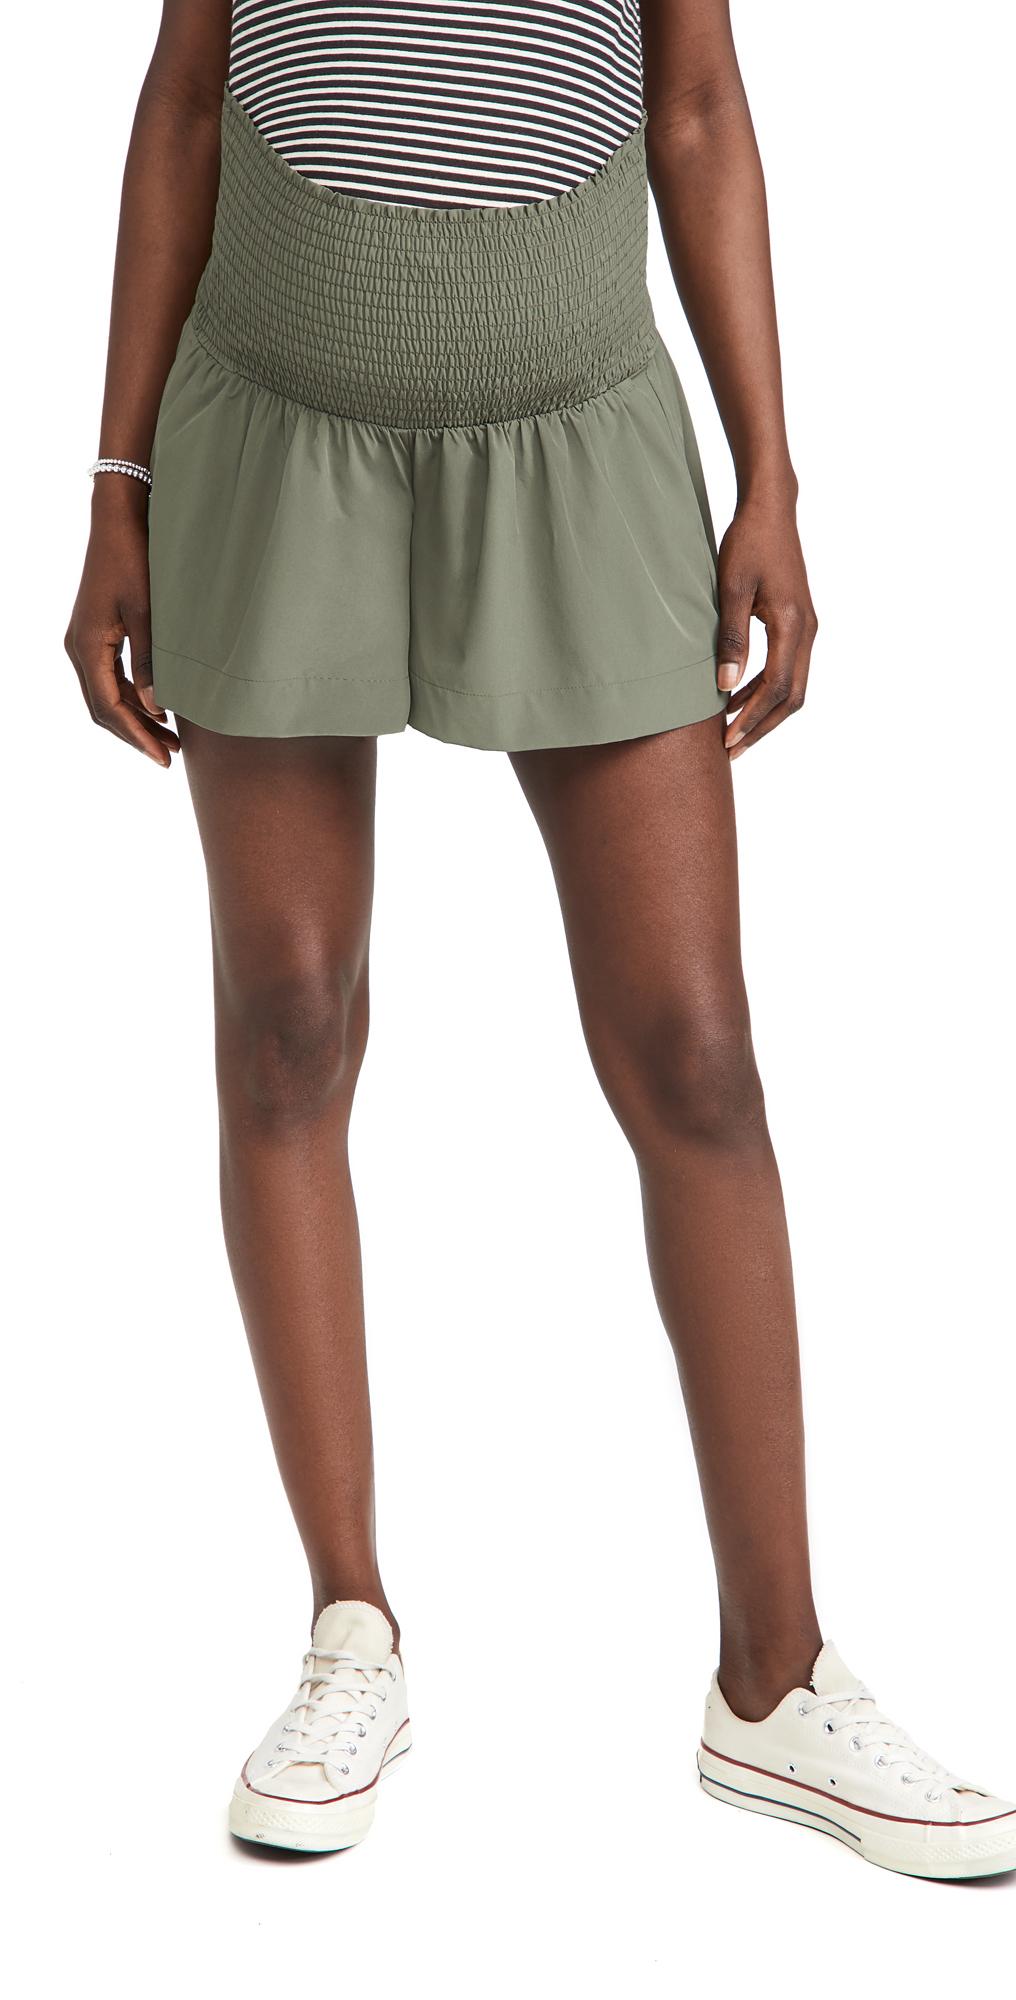 Ingrid & Isabel Easy Everywear Shorts